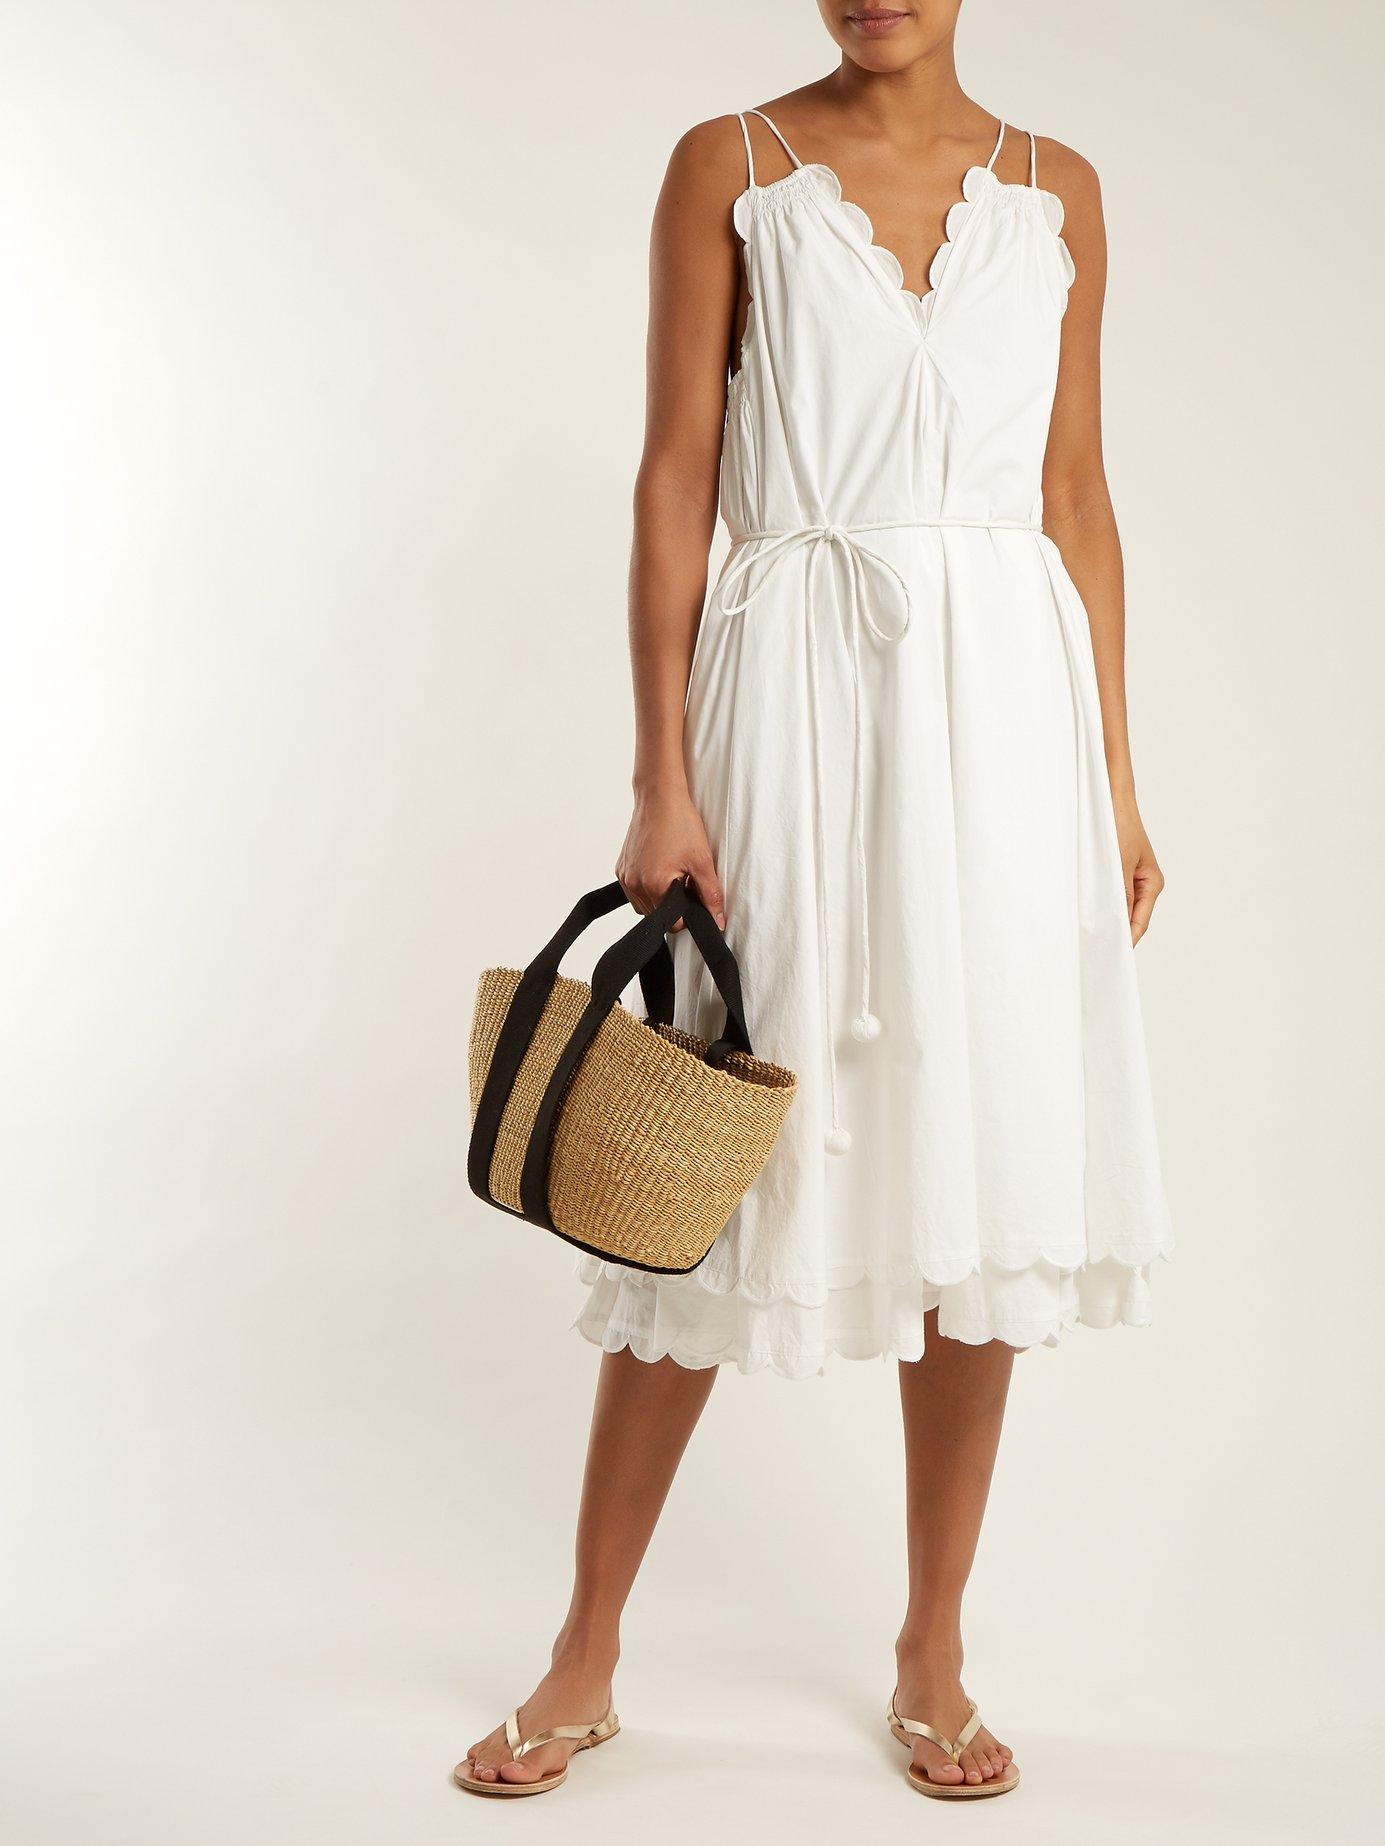 Mirage scalloped cotton-poplin dress by Apiece Apart